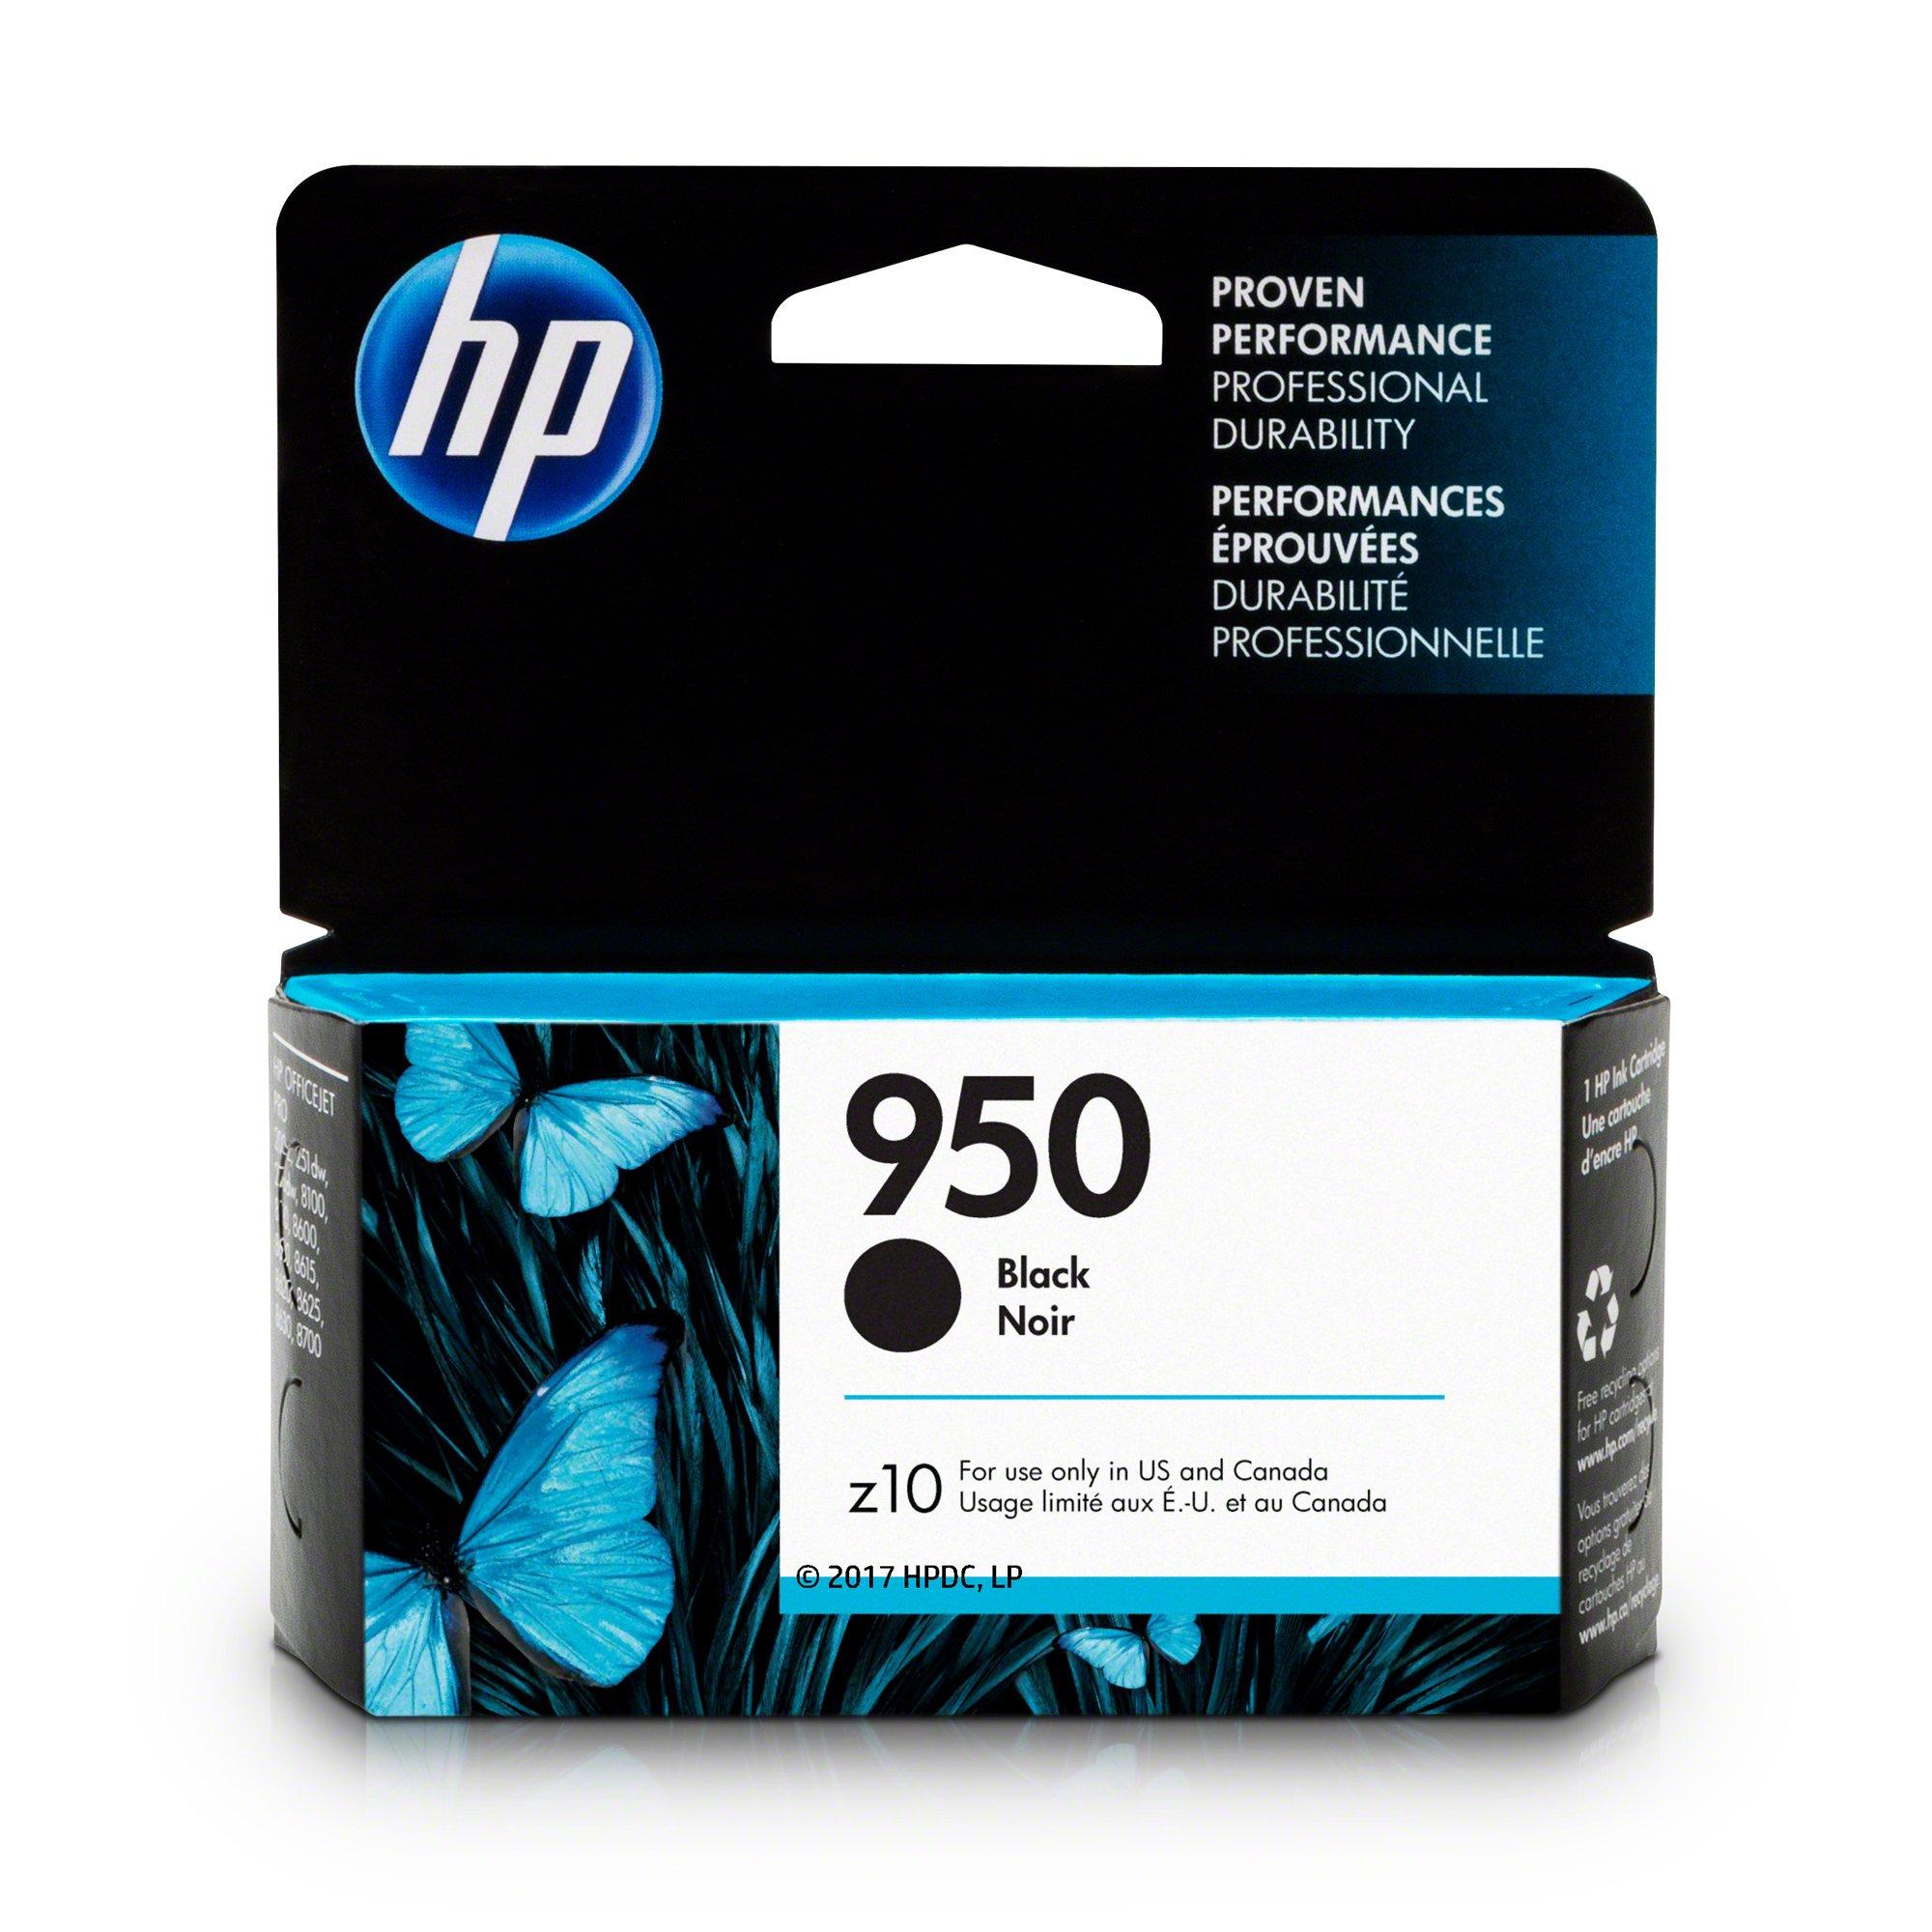 HP CN049AN#140 950 Black Ink Cartridge (CN049AN) for Officejet Pro 251, 276, 8100, 8600, 8610, 8620, 8625, 8630